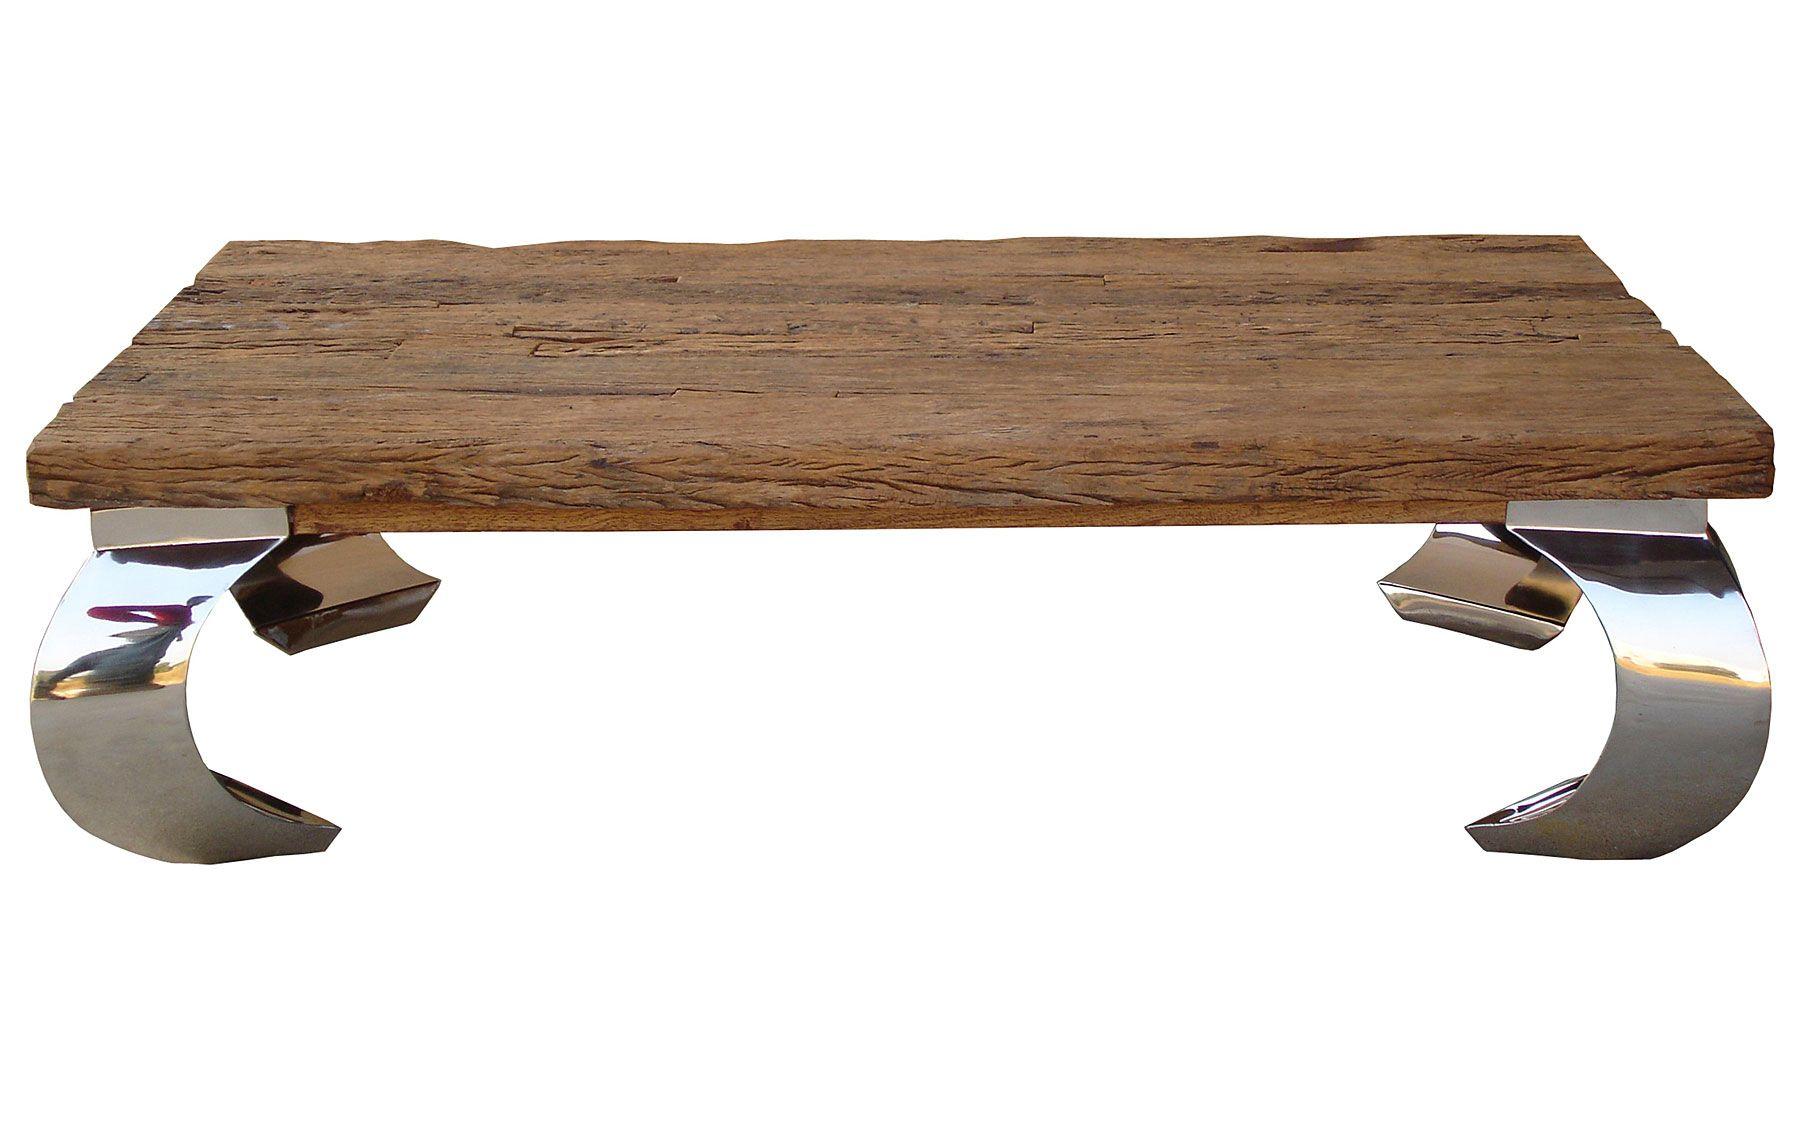 Tavolino Opium ~ Mesa de centro opium recicled material madera tropical mesa de